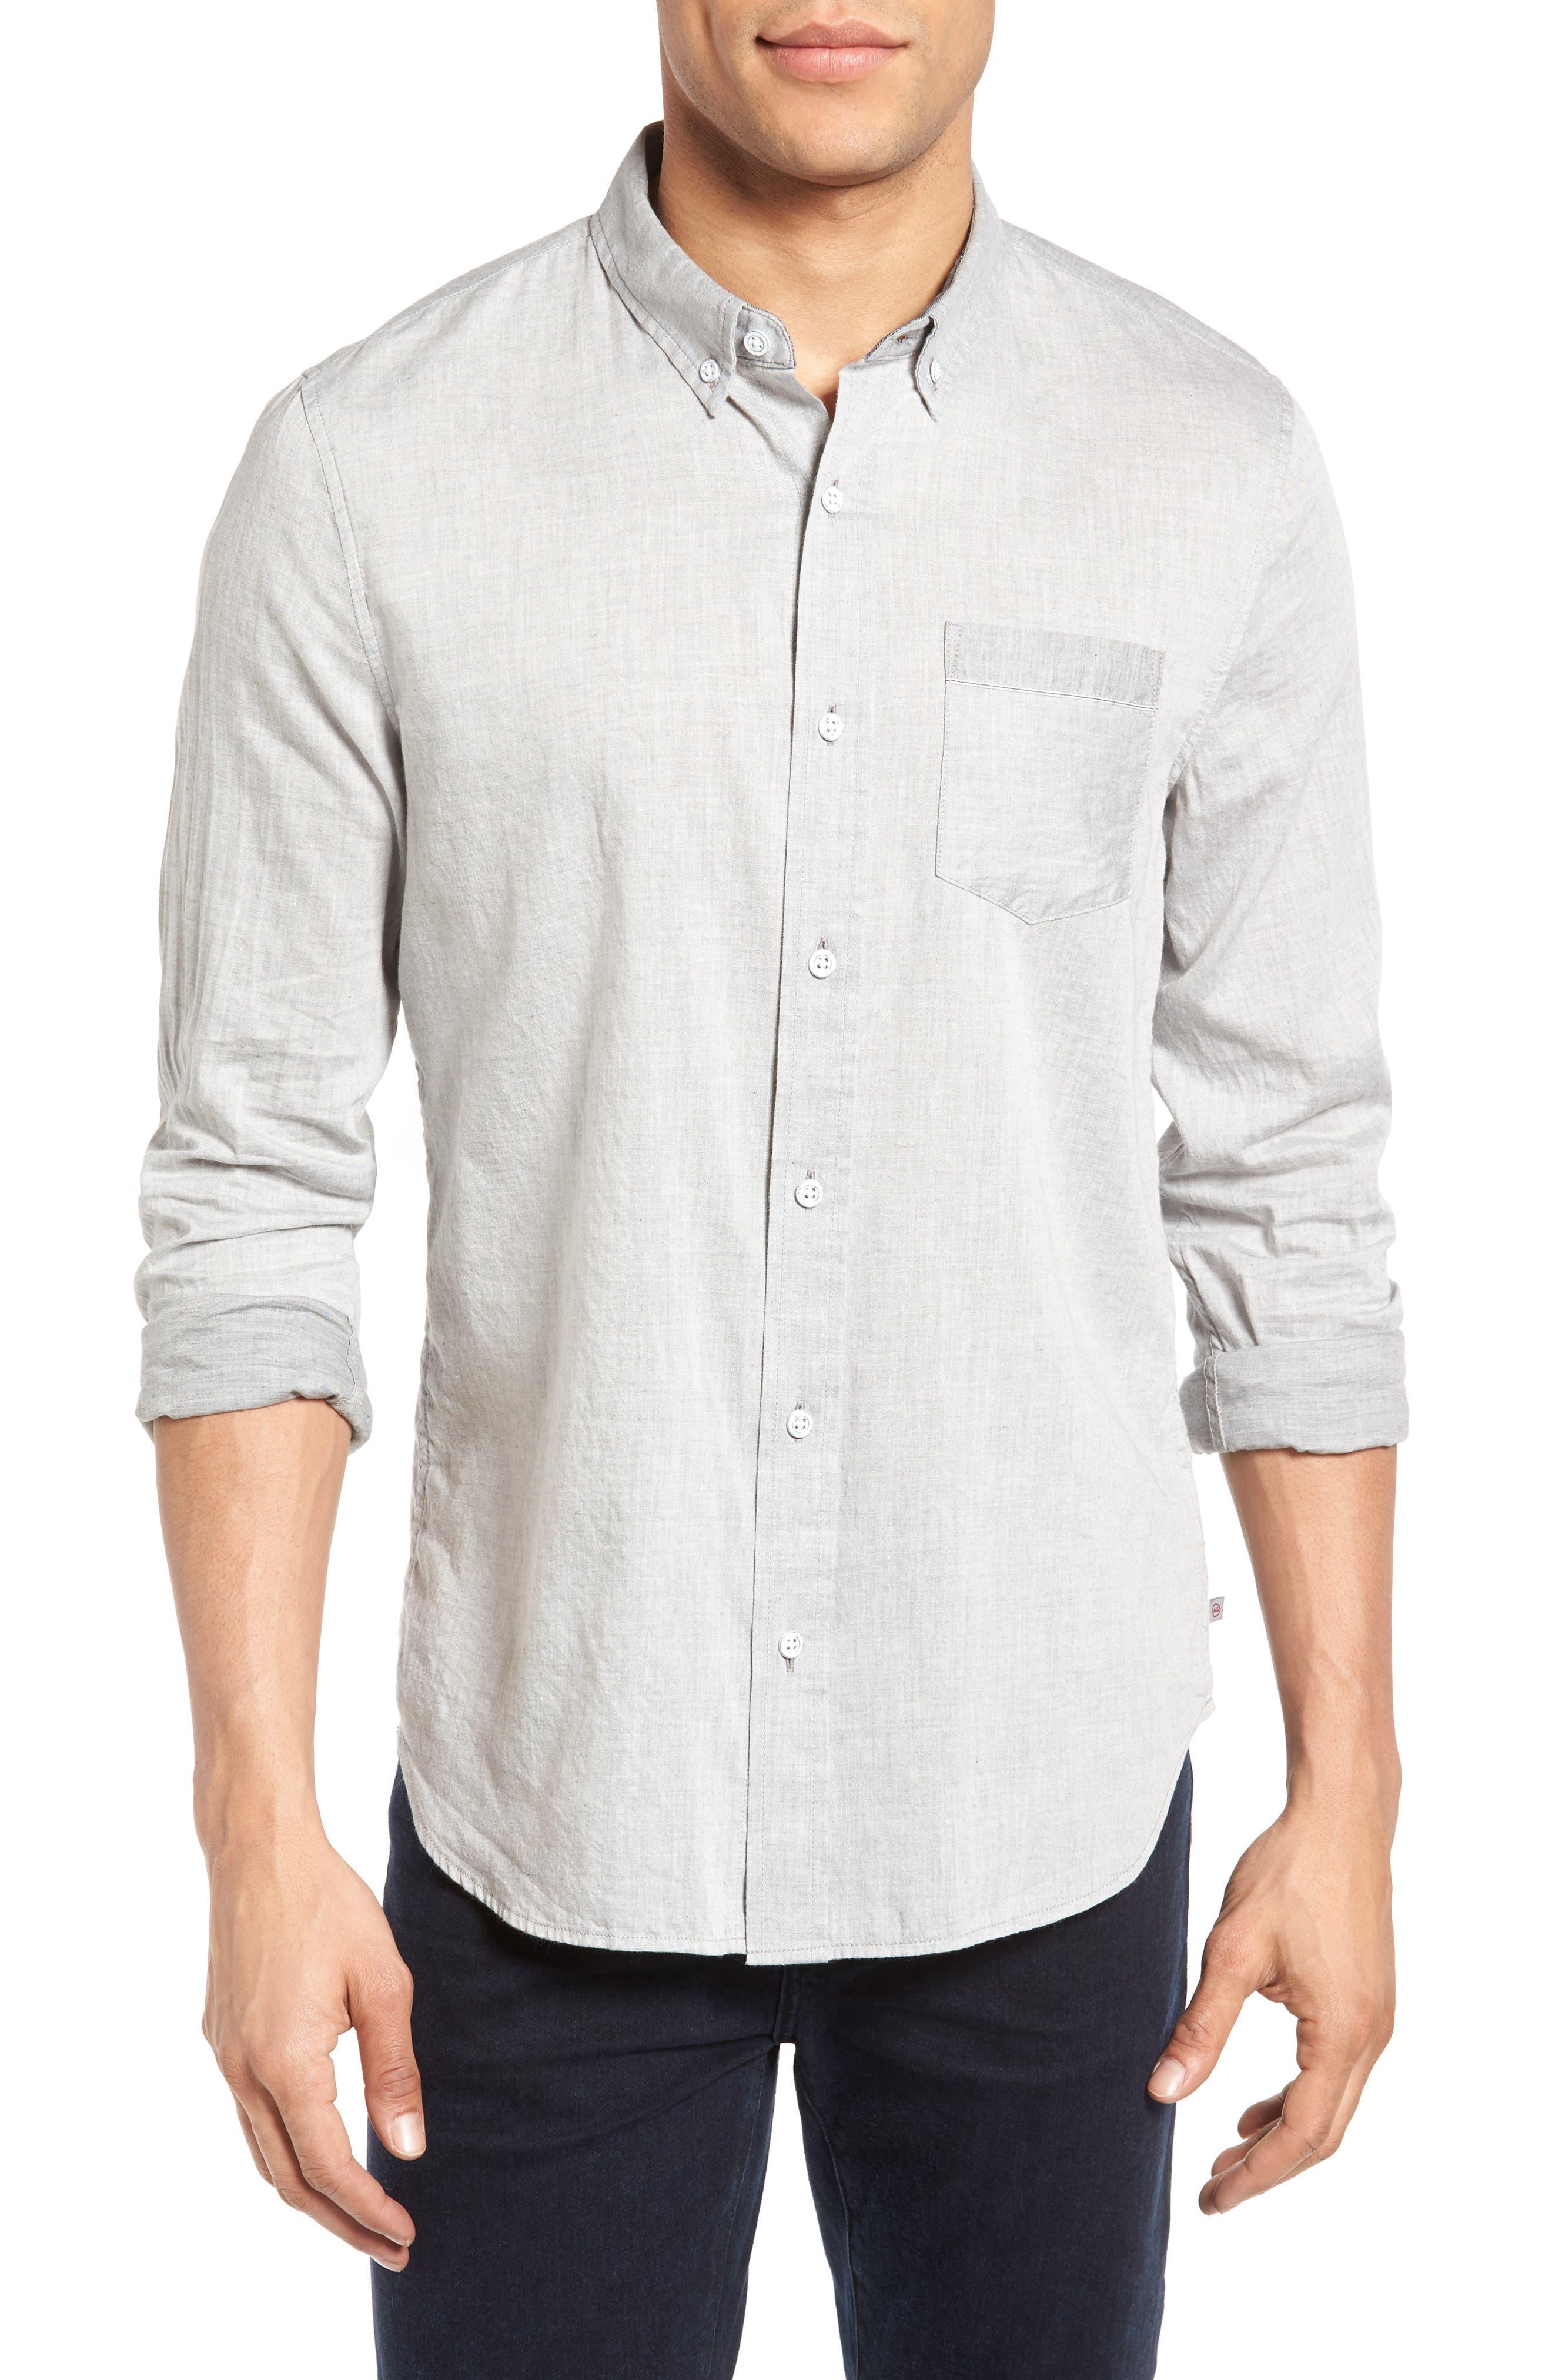 Main Image - AG Grady Trim Fit Sport Shirt